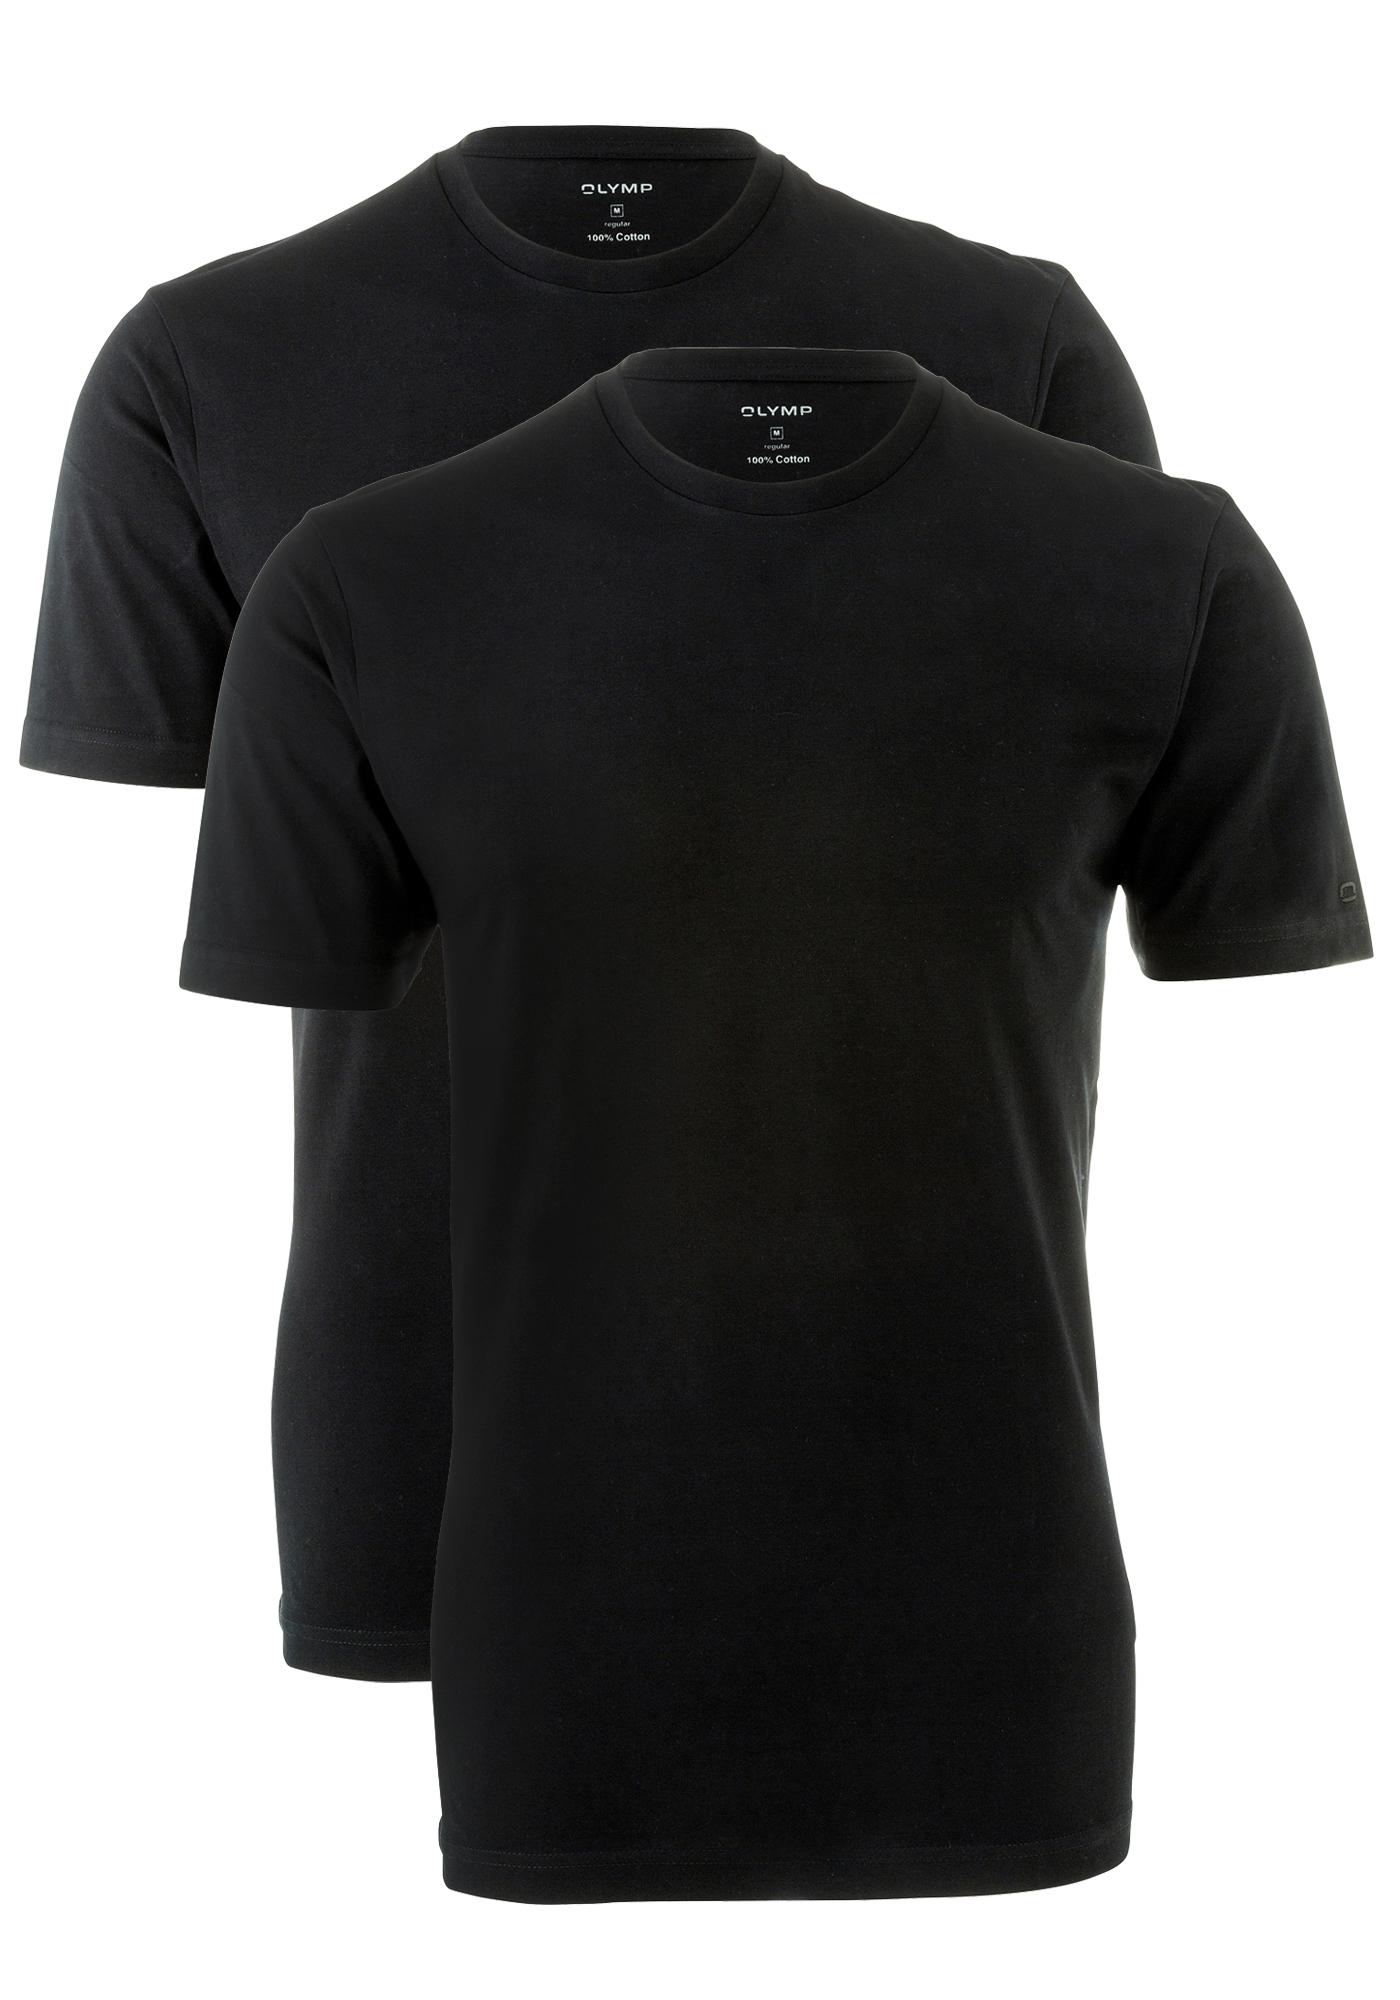 grote maten heren tshirts olymp